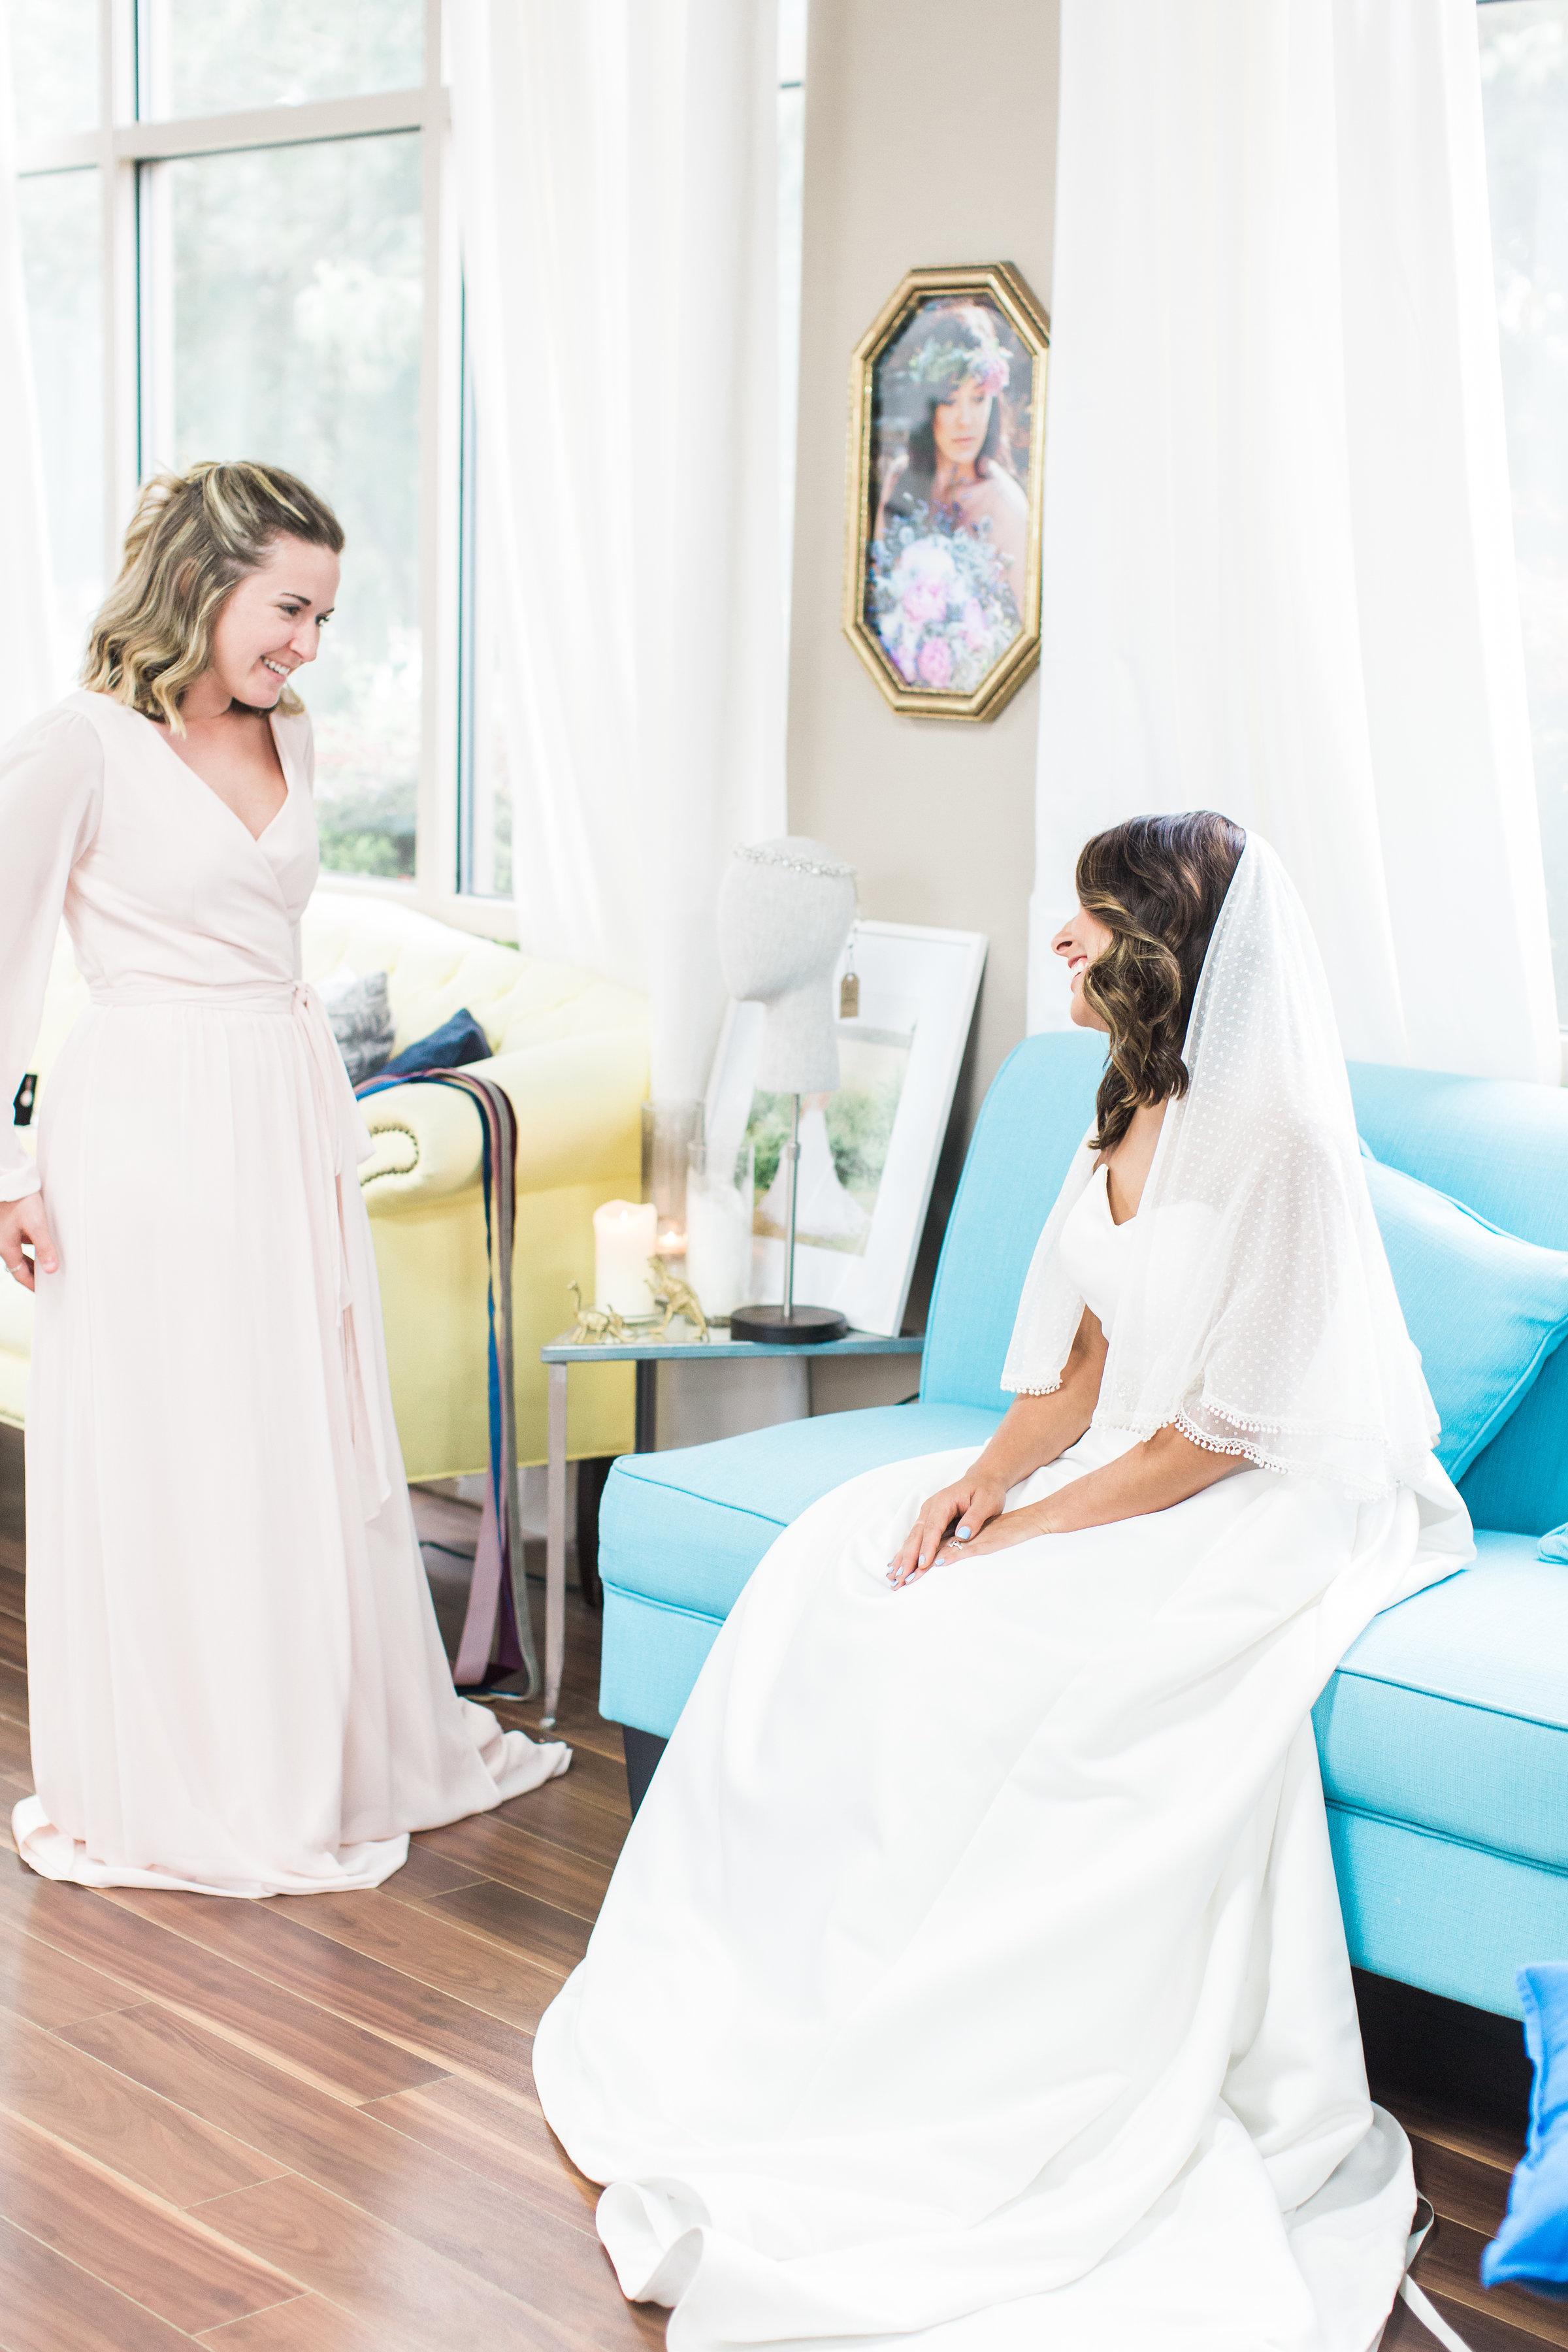 savannah-bridal-boutique-ivory-and-beau-savannah-bride-savannah-bridal-shop-wedding-dress-savannah-weddings-wedding-dress-savannah-aptbphotography-aptbphoto-veils-tiaras-bridal-jewelery-bridesmaids-dresses-bridesmaids-gowns-savannah-bridesmaids.jpg-86.jpg